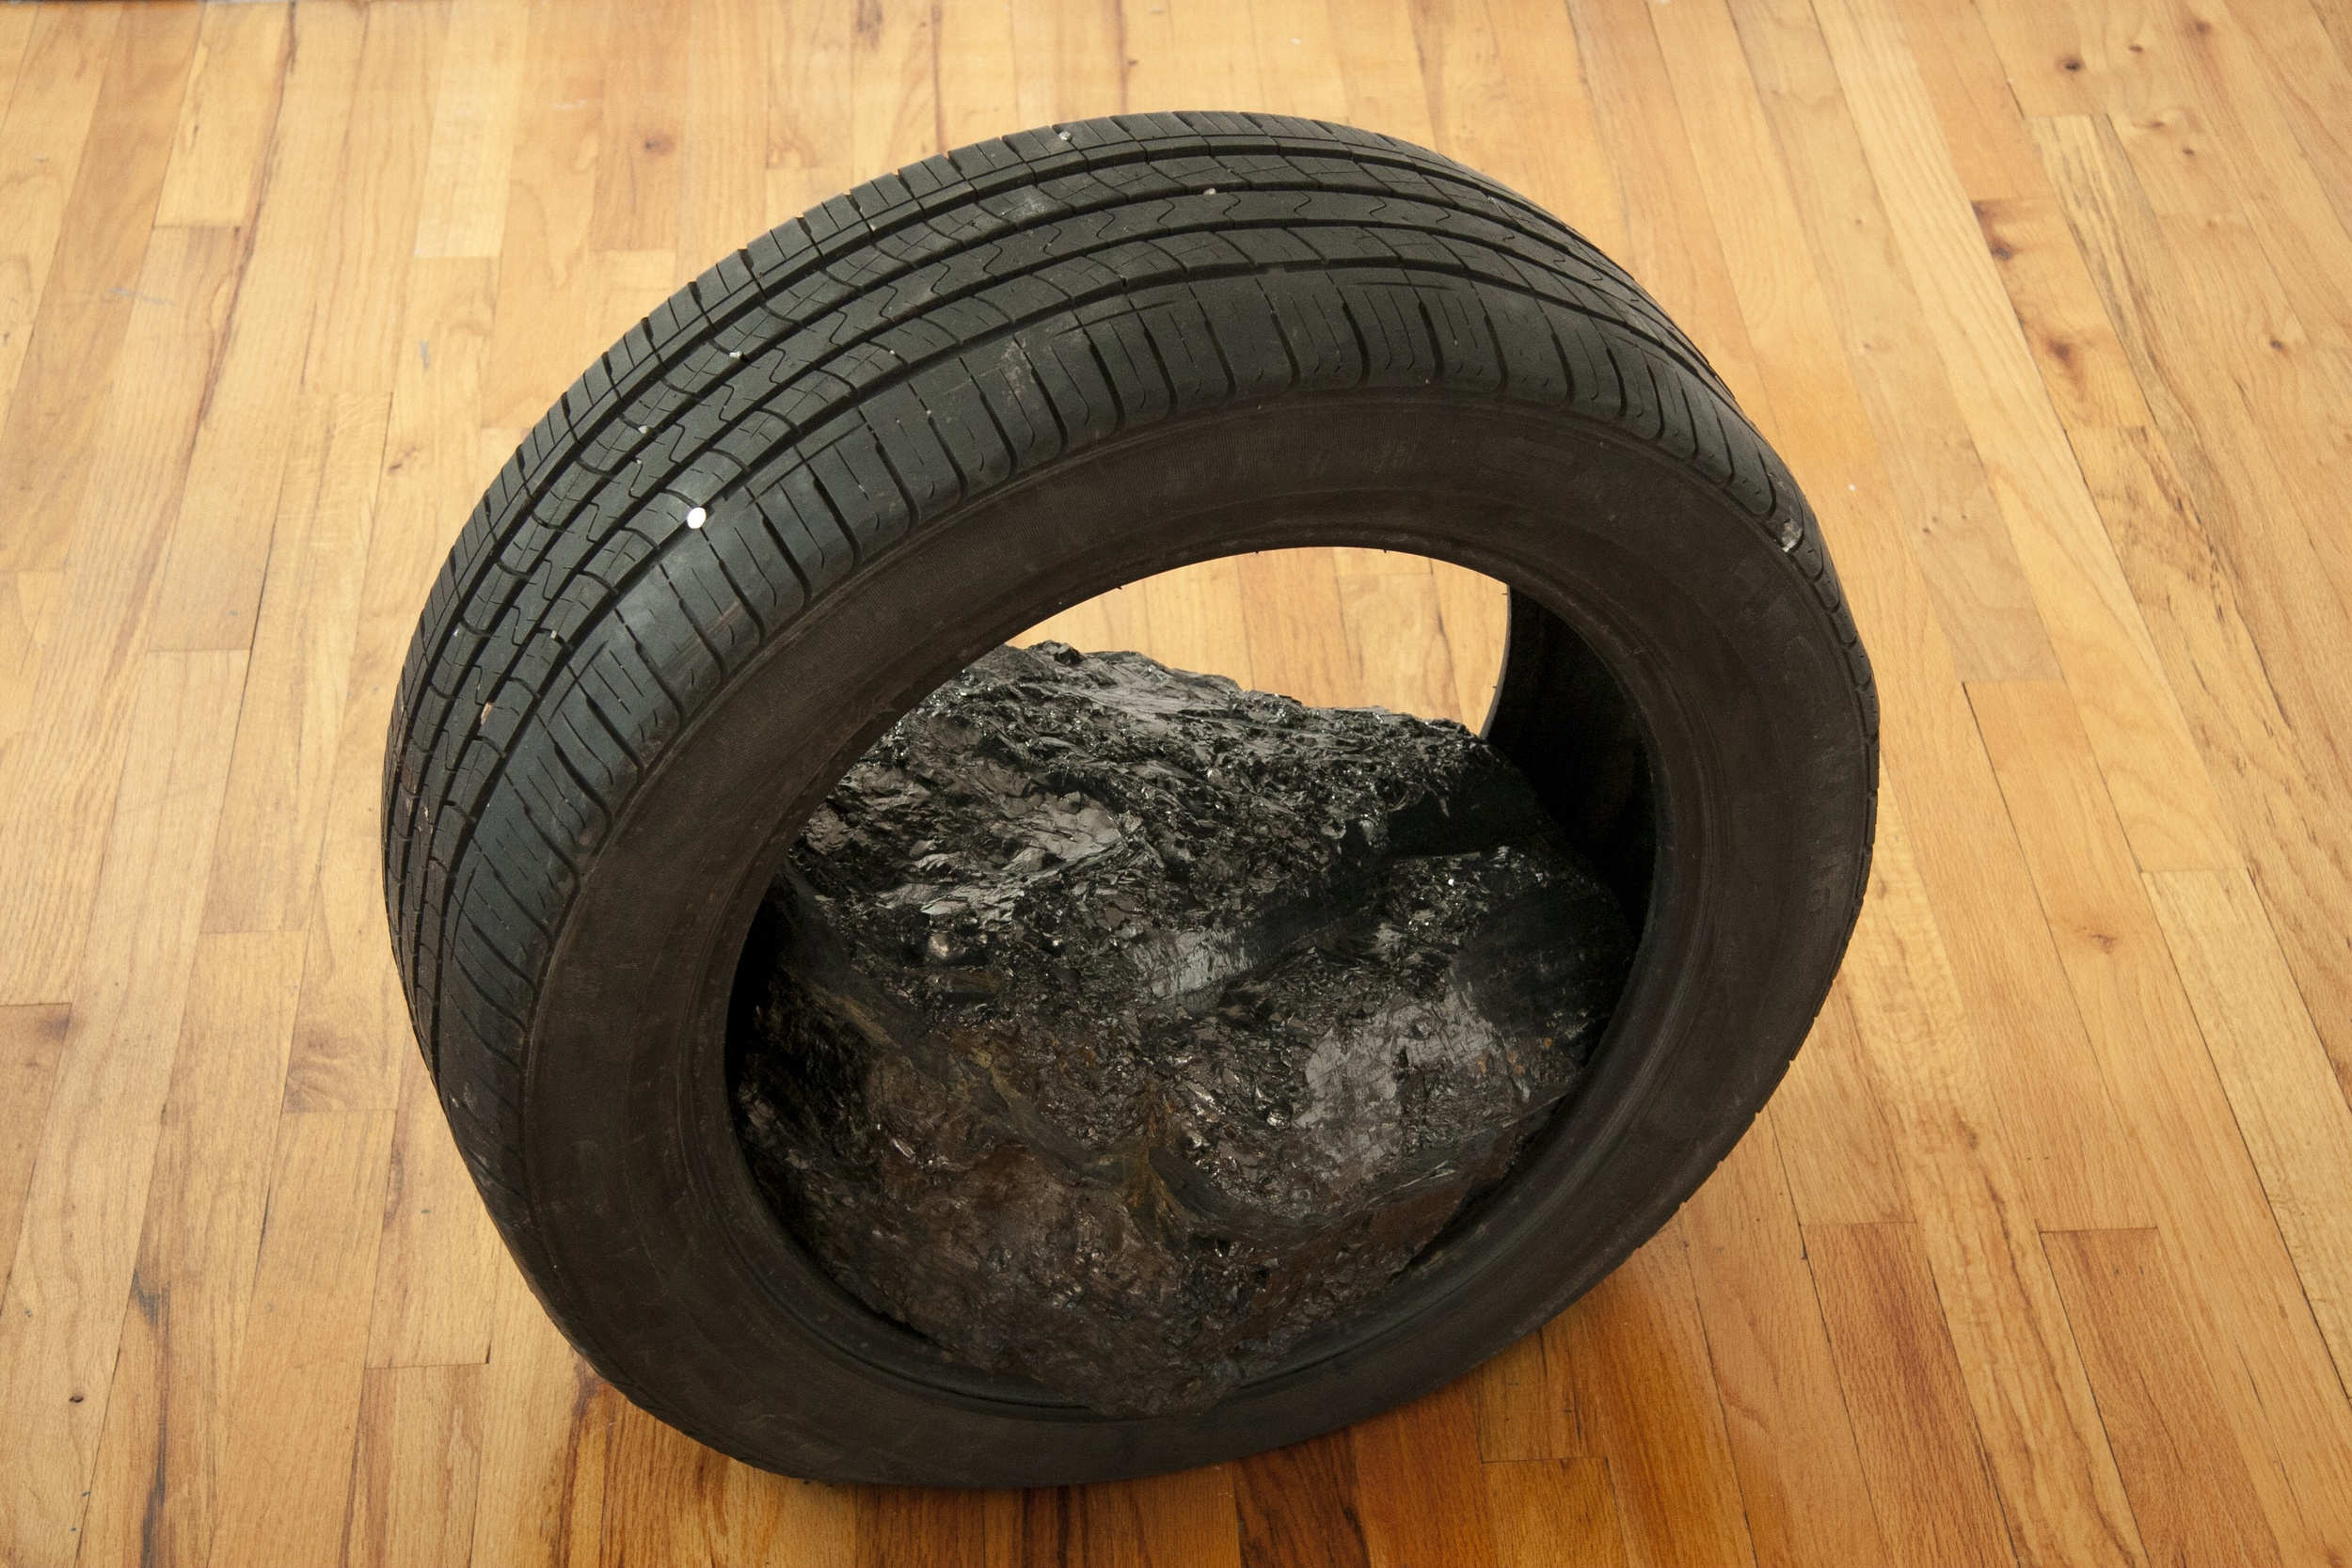 "Terra,   2013  tire, anthracite  23"" x 25"" x 14"""